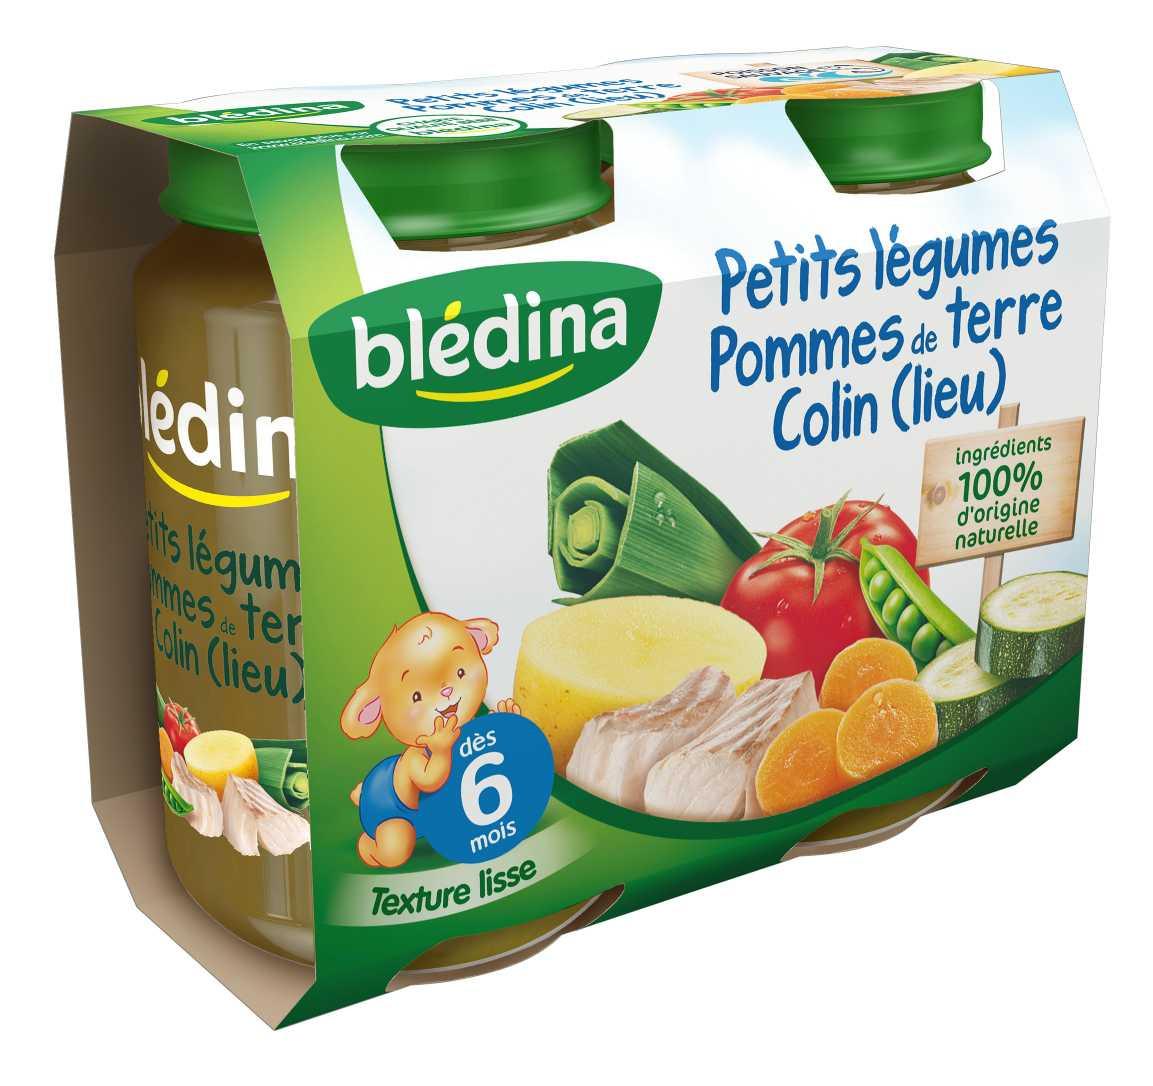 Initier Bébé Au Pot pot petits légumes pommes de terre colin 2x200g bledina